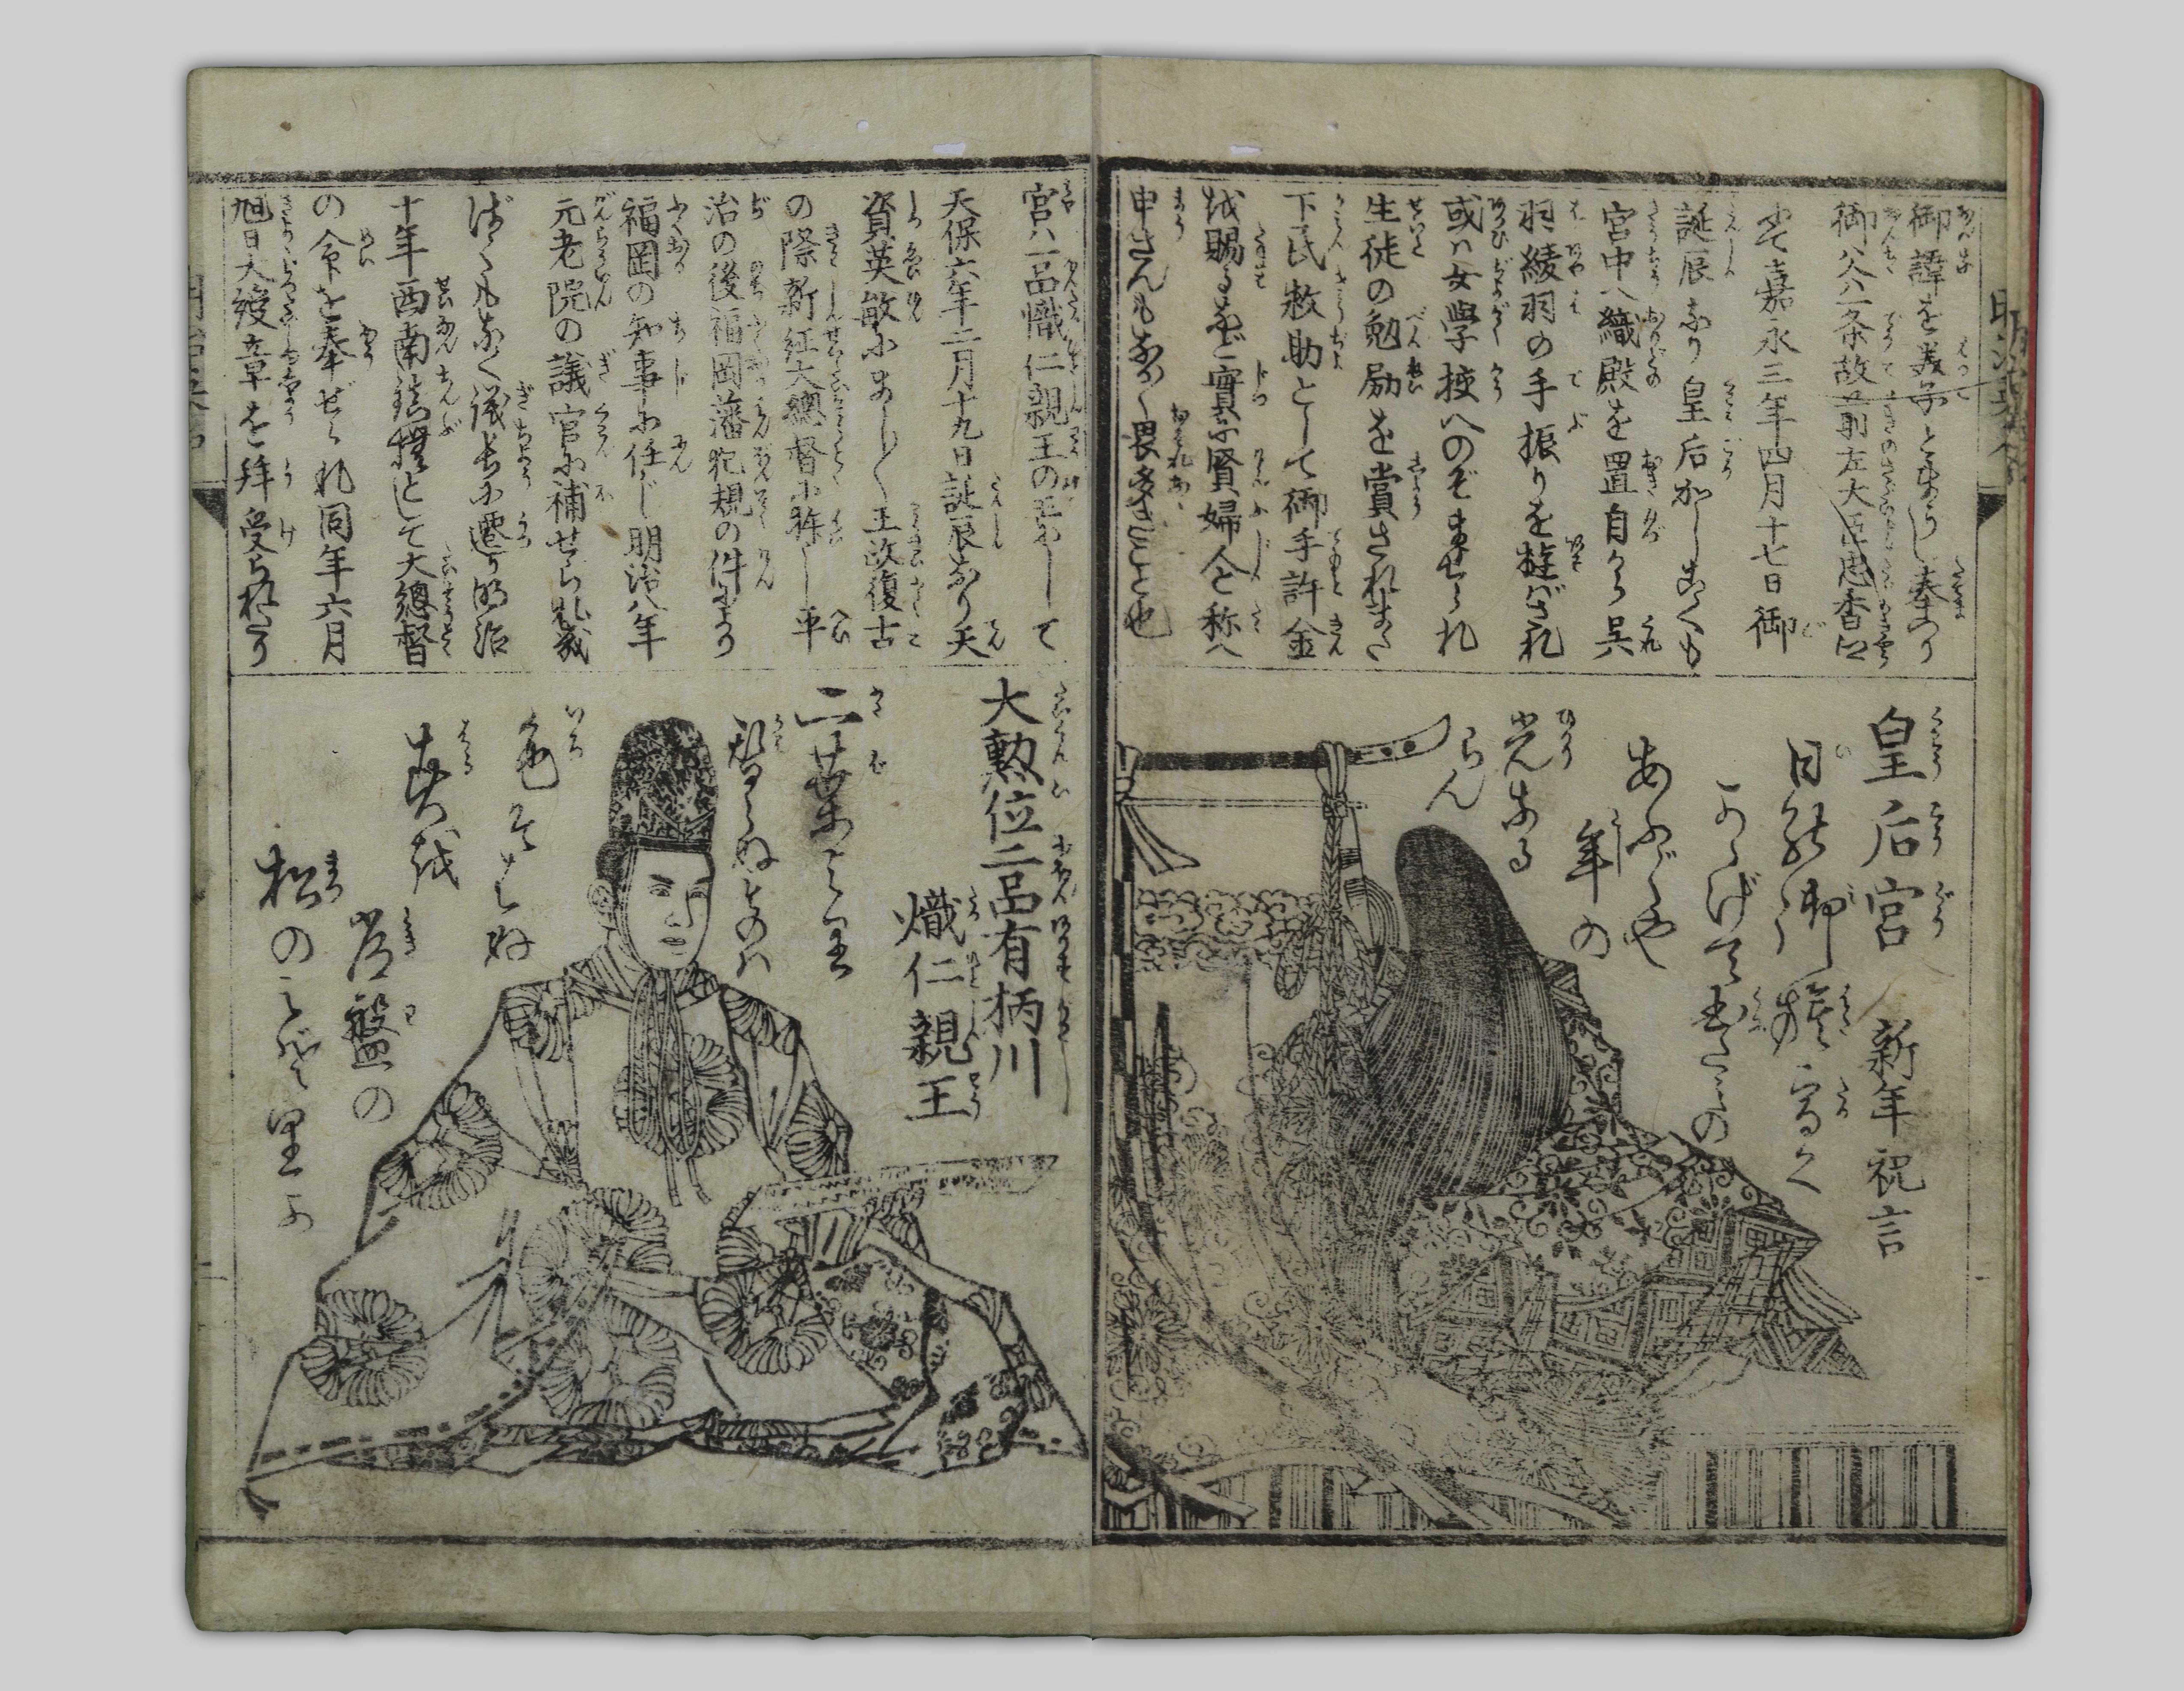 An illustration from Meiji Eimei Hyaku'ei Sen depicting Empress Shōken and Prince Arisugawa Taruhito.